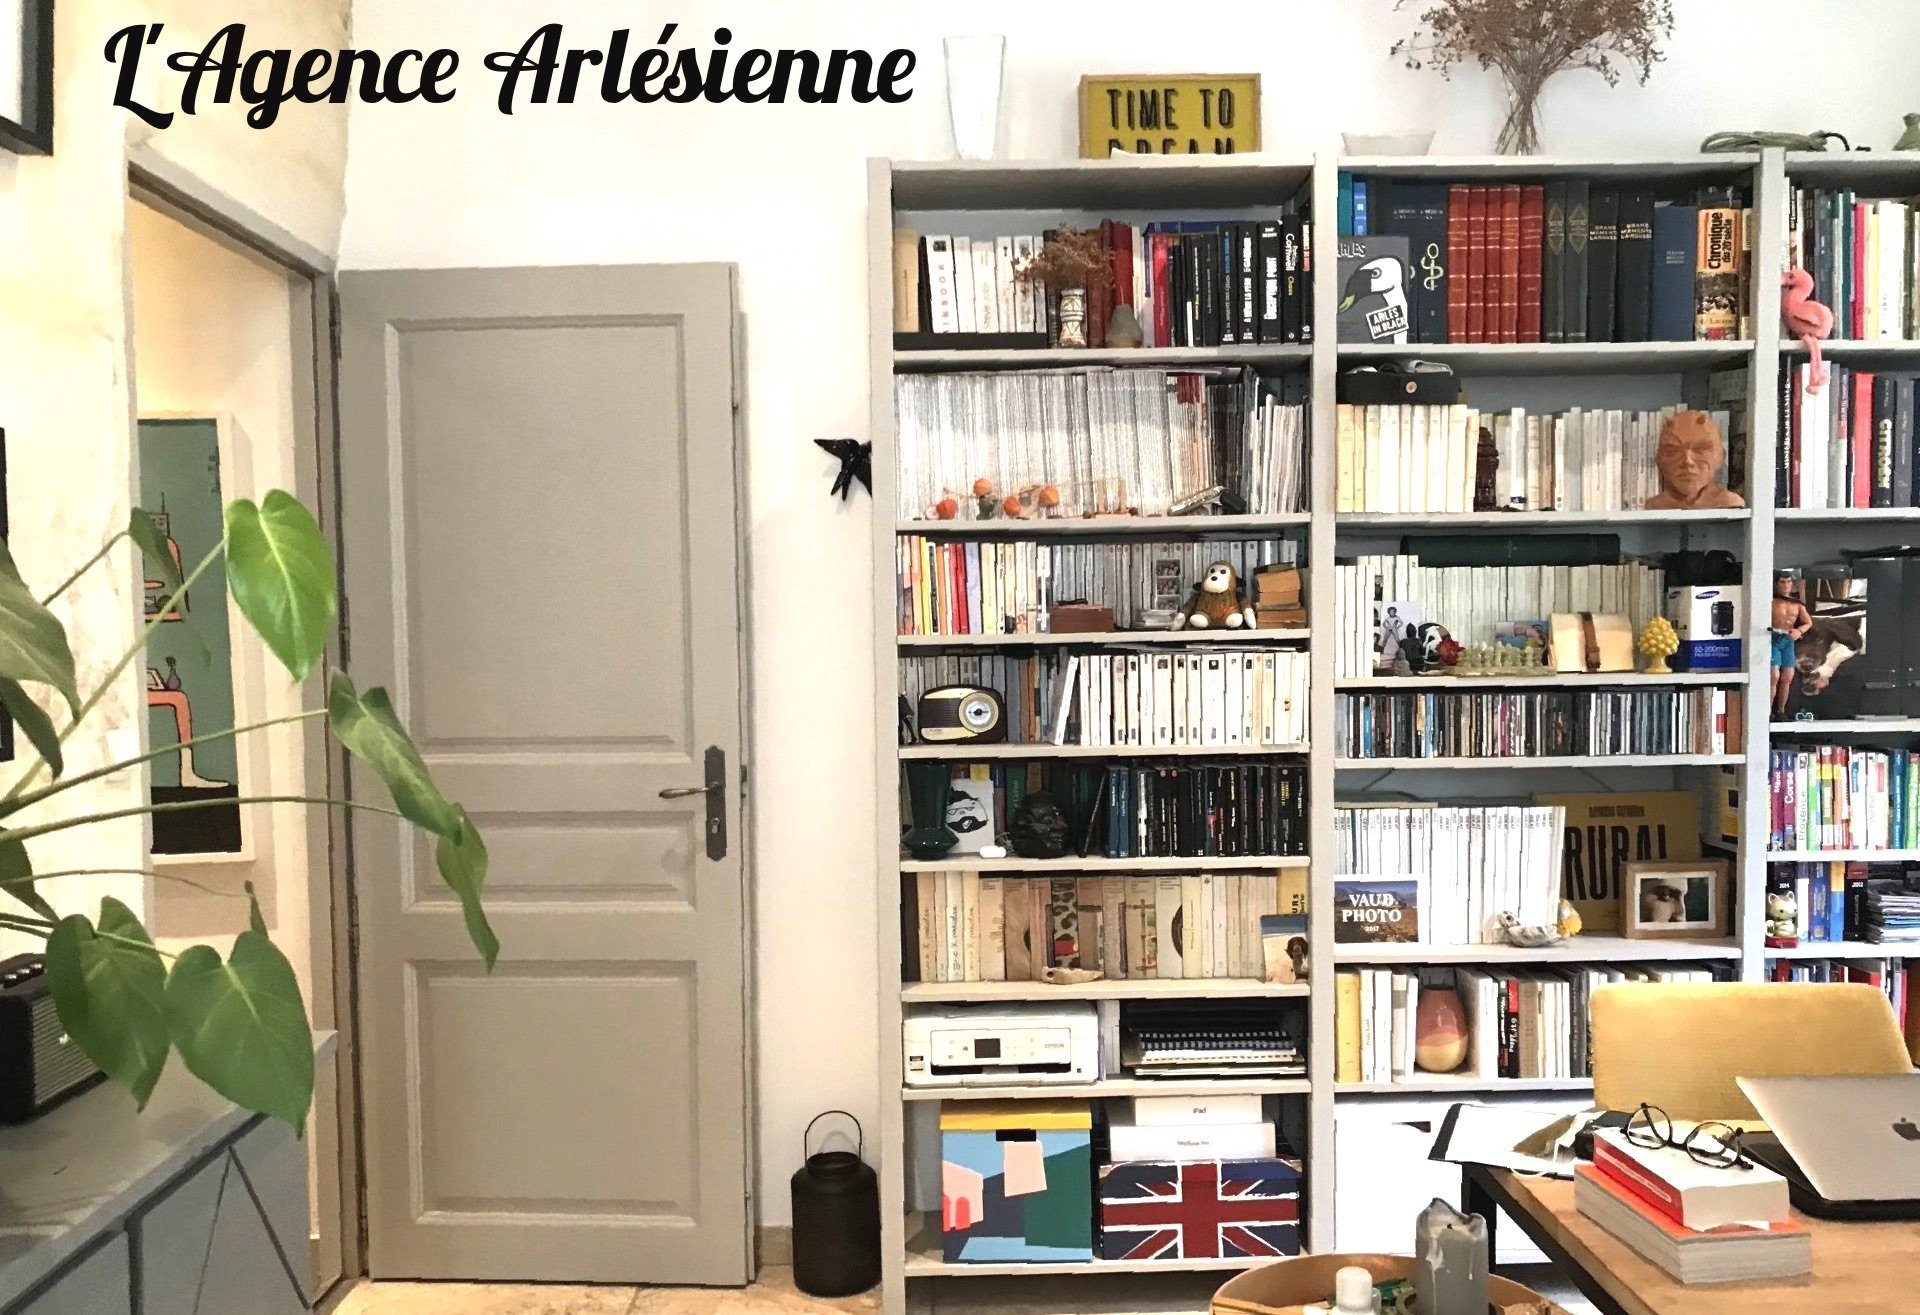 L' Agence Arlesienne